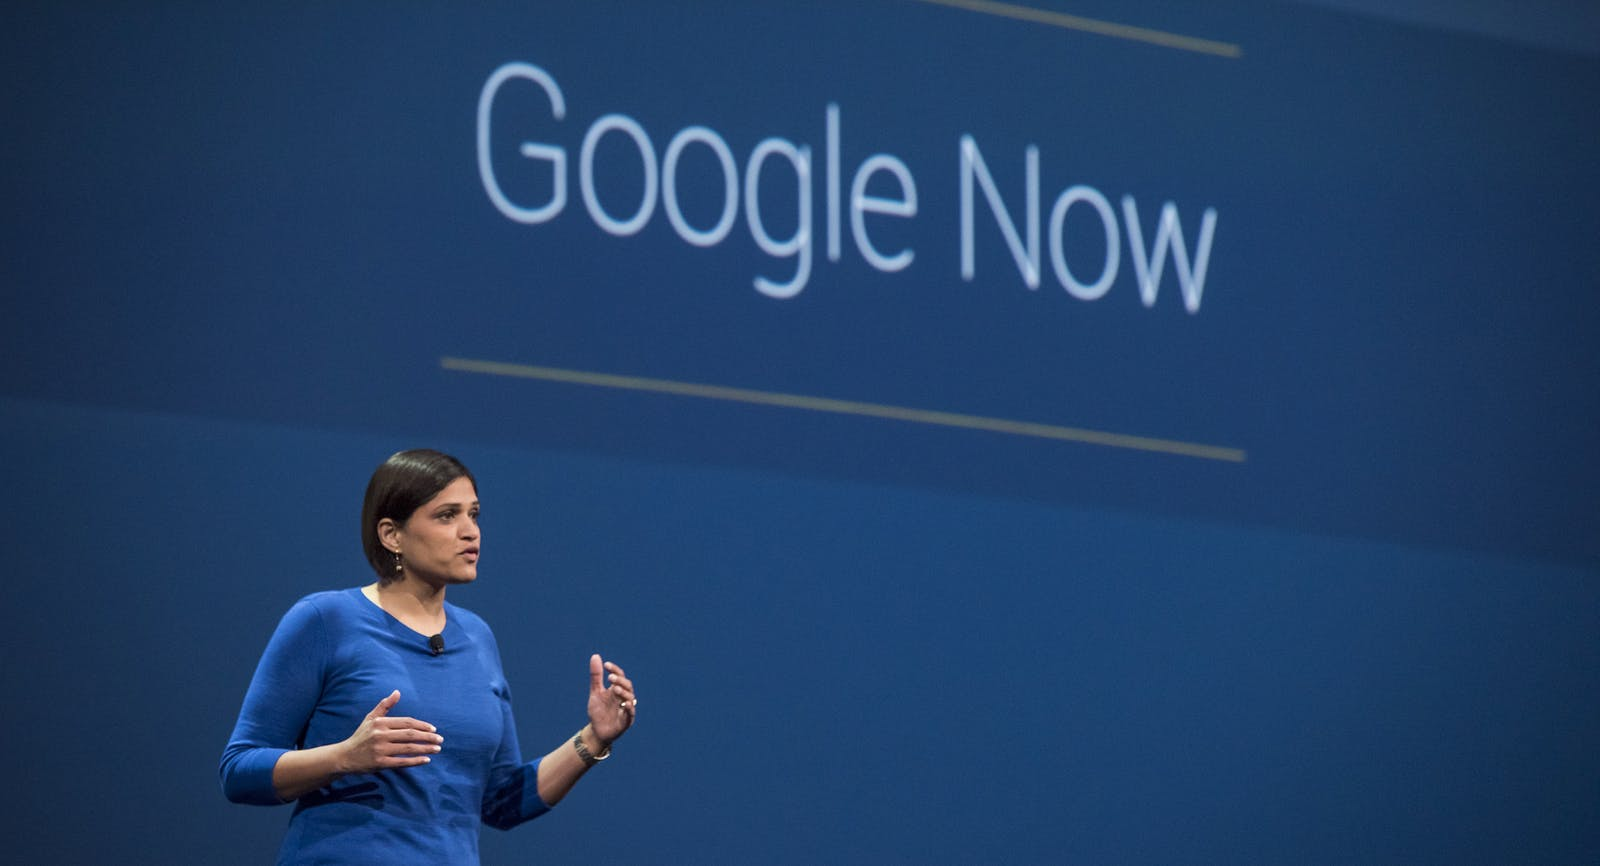 Aparna Chennapragada runs Google Now. Photo by Bloomberg.